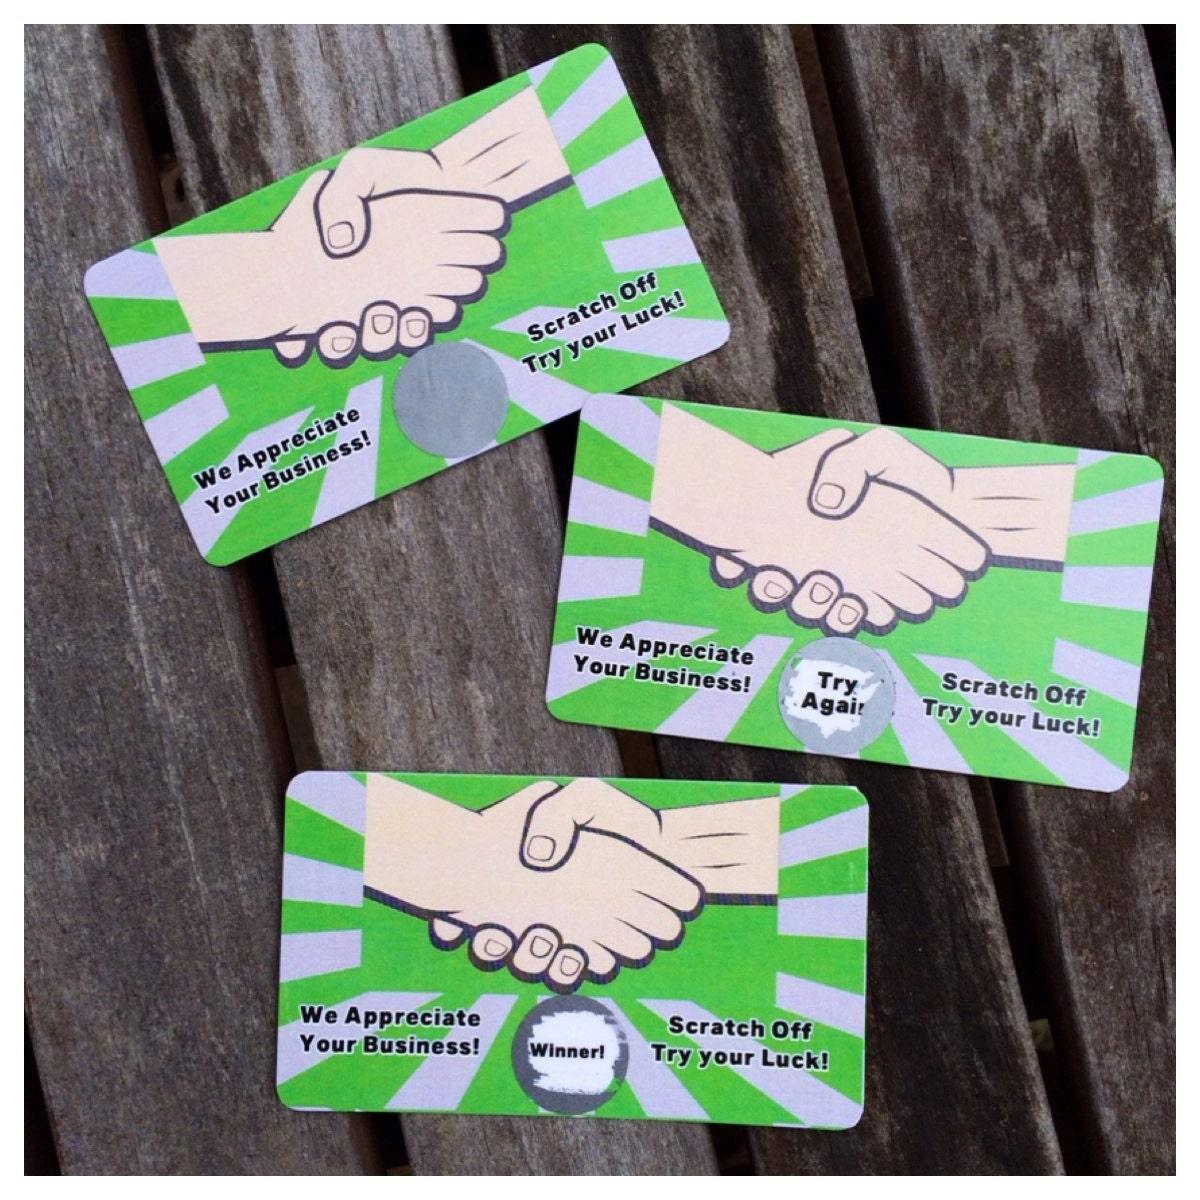 We appreciate your business scratch off game card for We appreciate your business cards